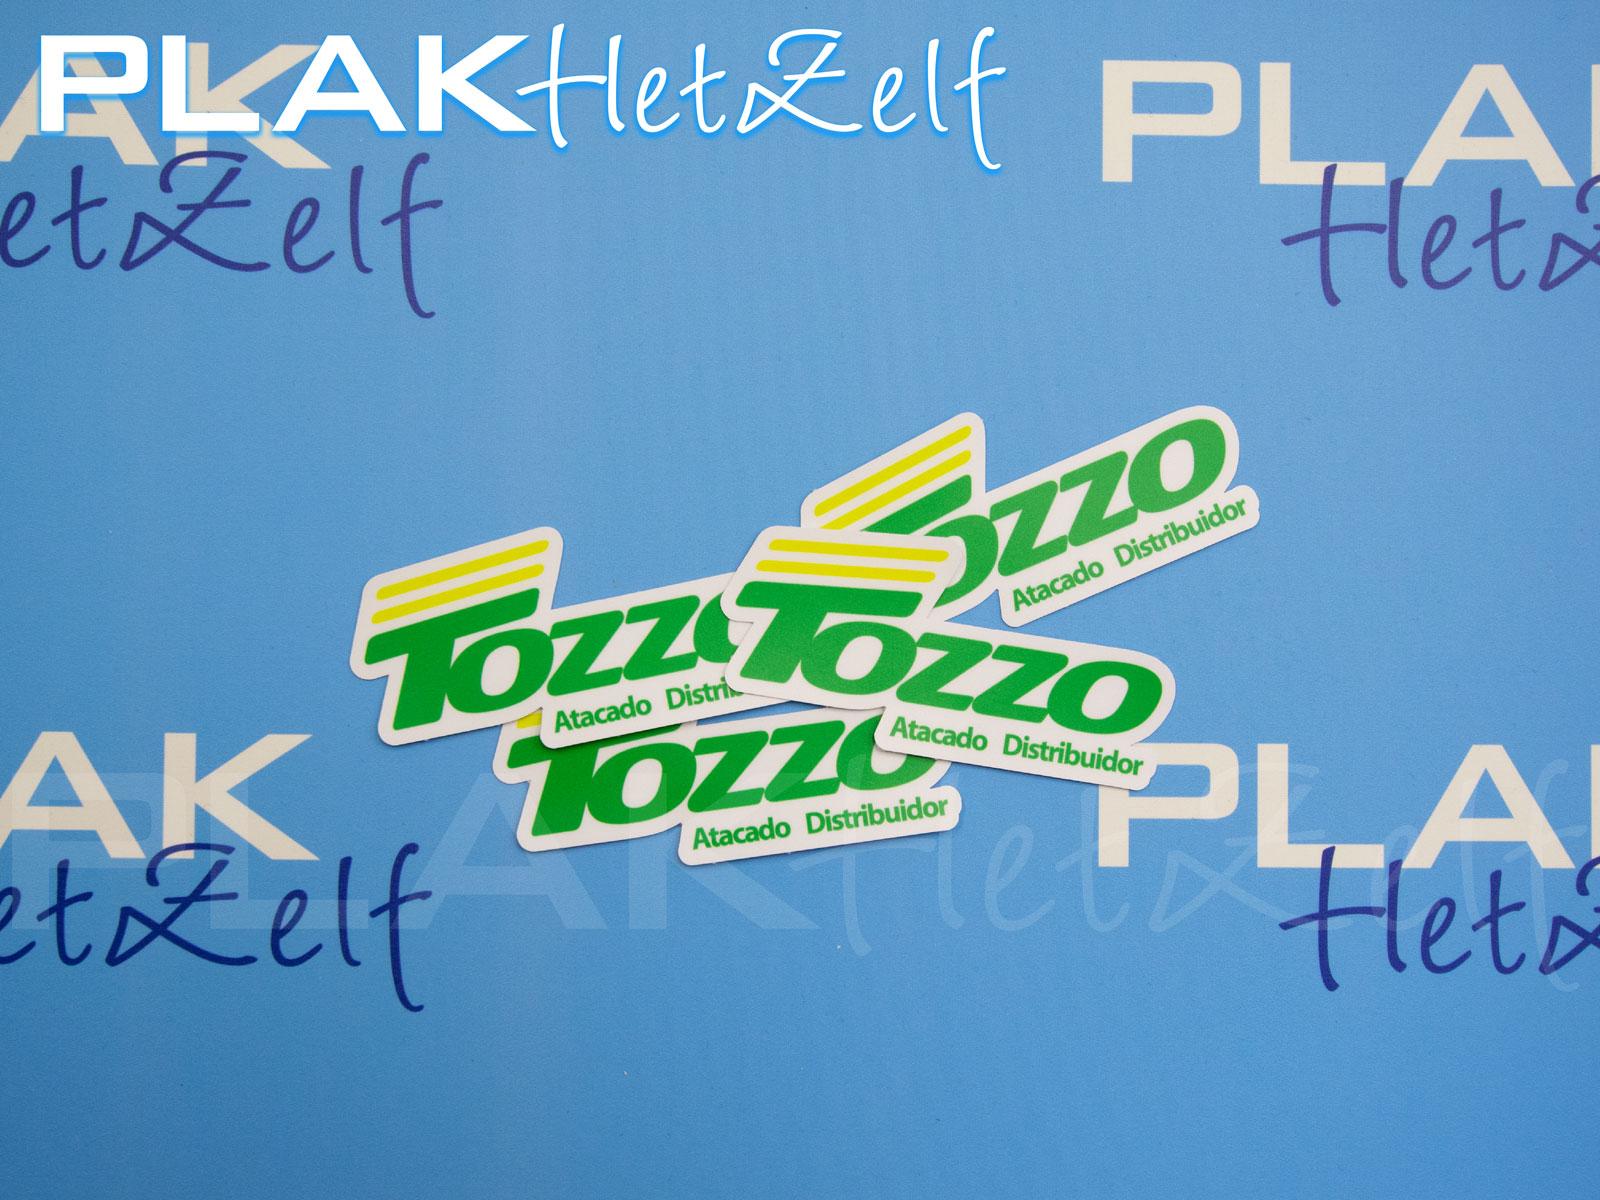 stickers, reclame campagne, logo, mat, S10M, bestellen, laten printen